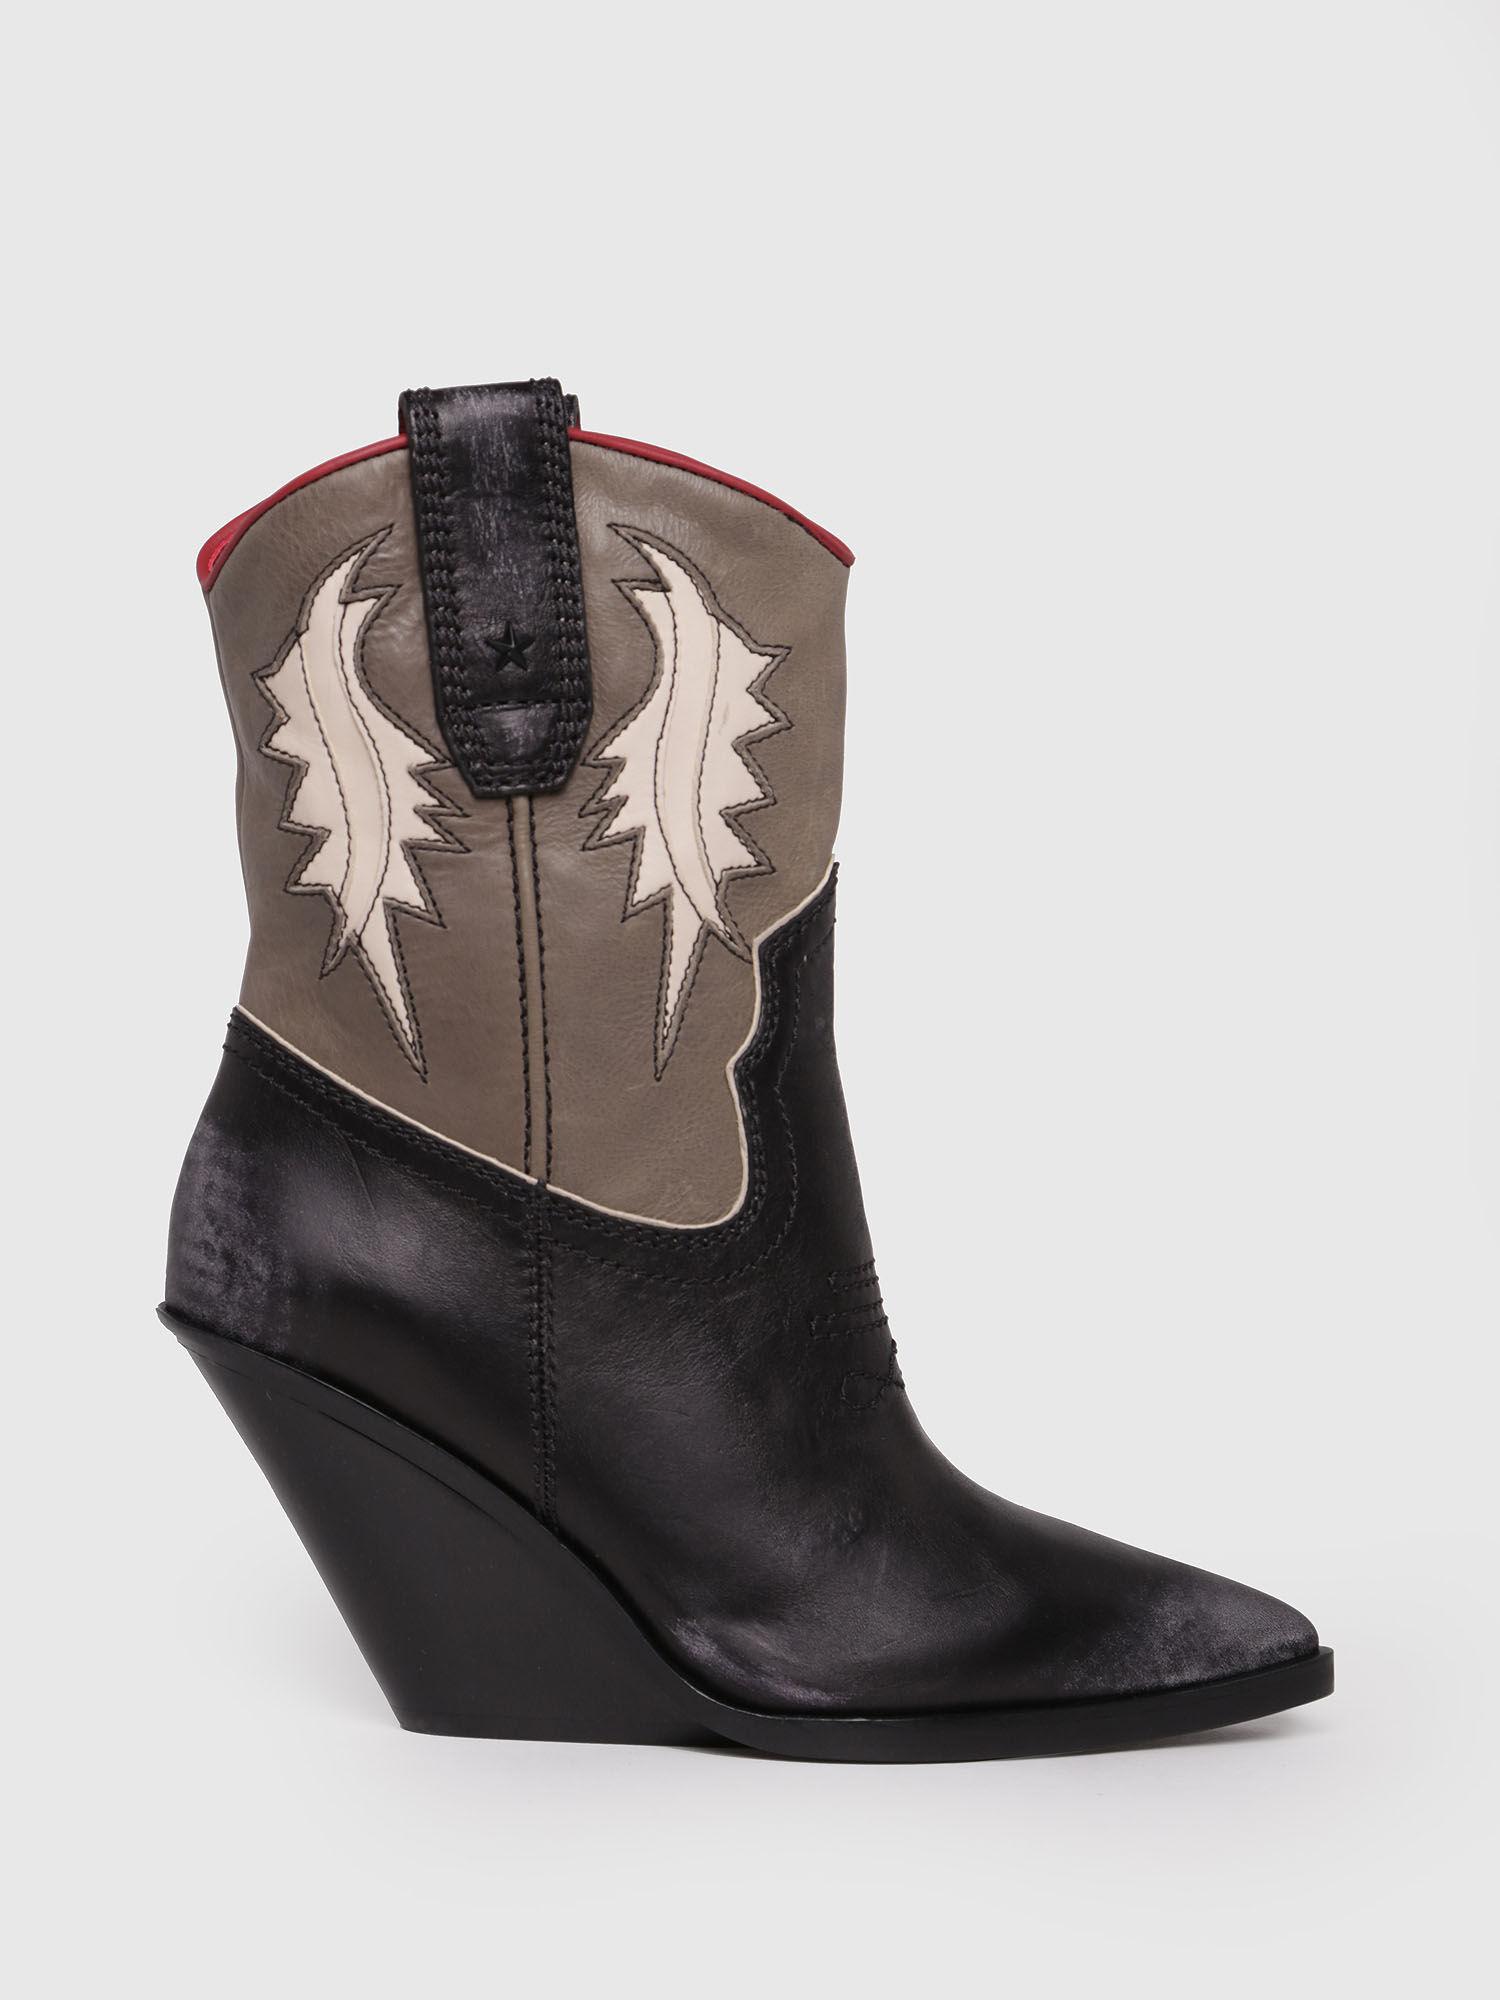 À With No Chaussures Go Plan Plates Diesel Talon Femme · SqnE1X